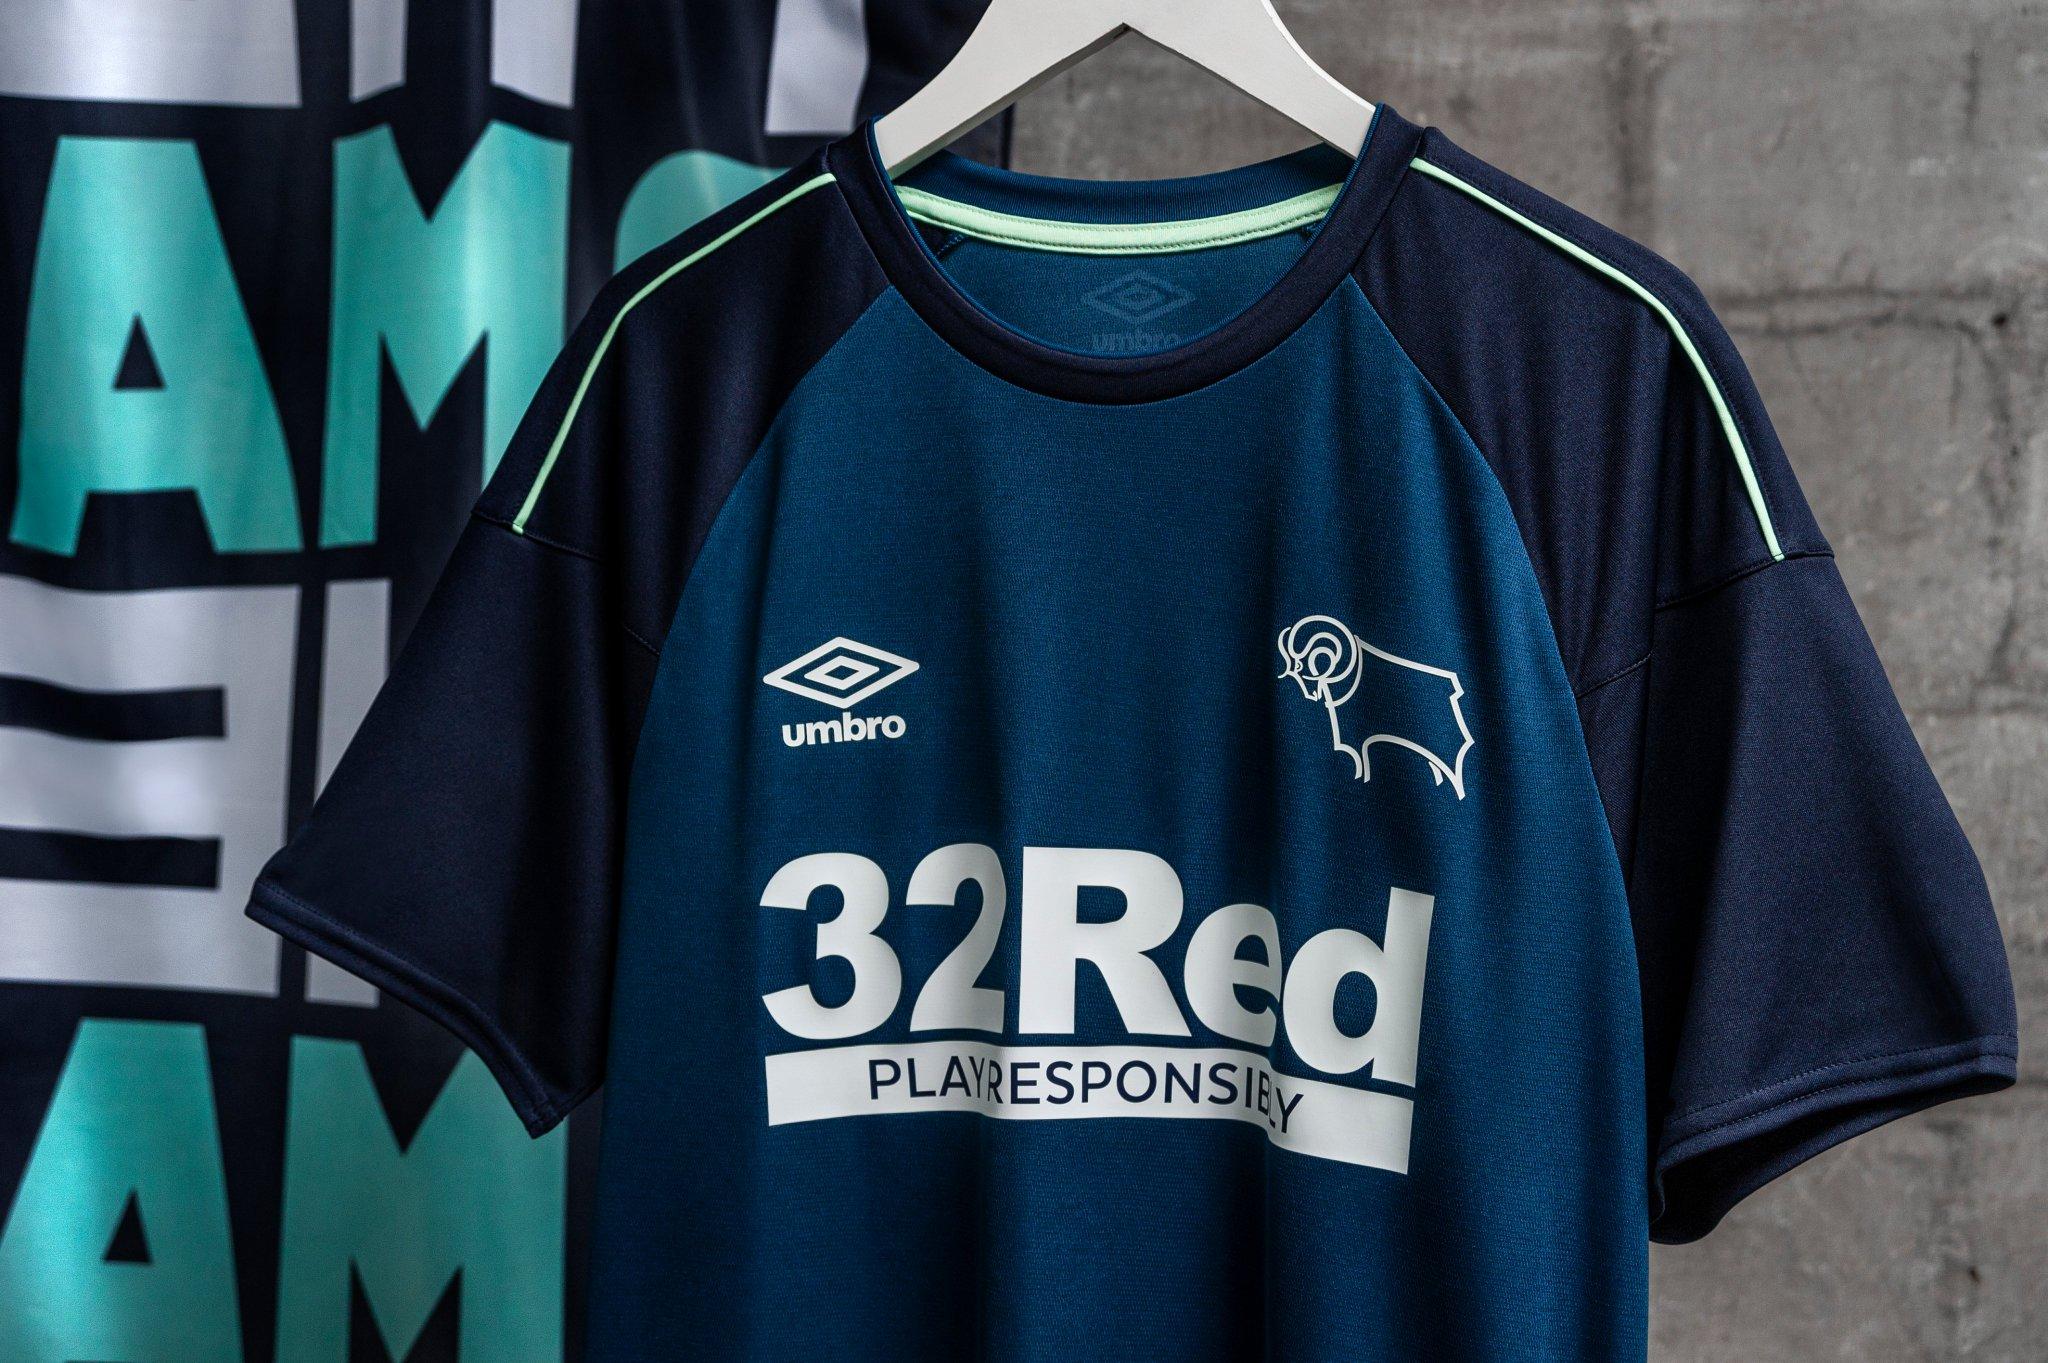 Derby County 2020-21 Umbro Away Kit   20/21 Kits   Football shirt blog